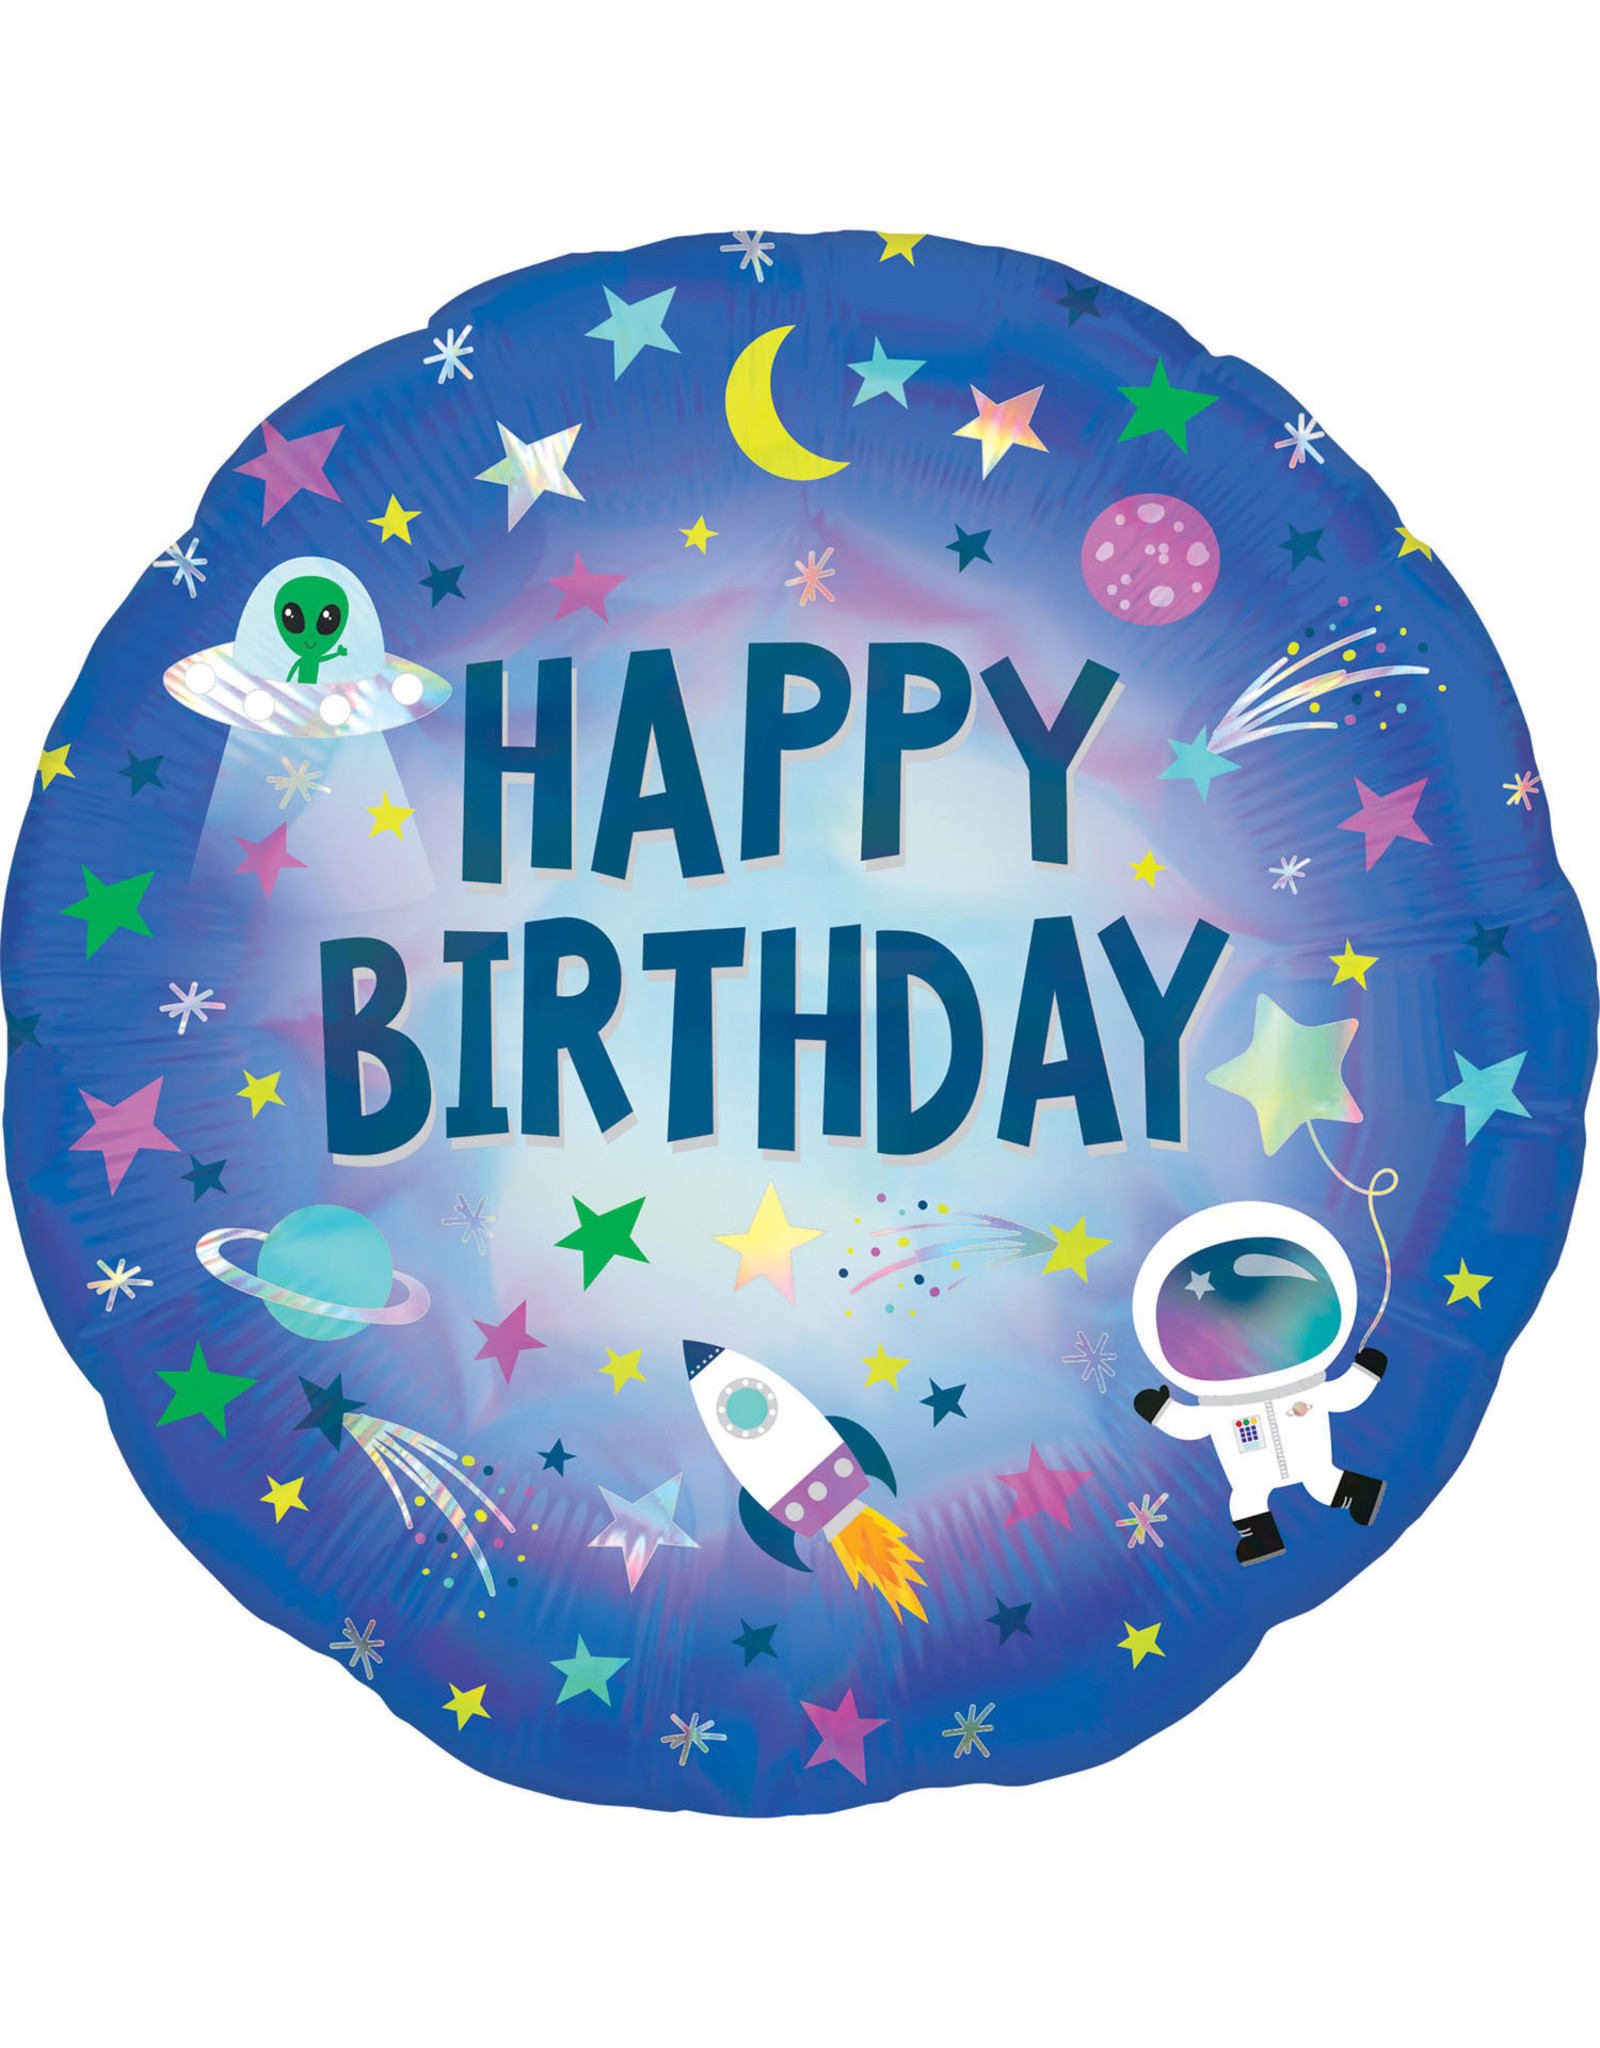 Amscan folieballon happy birthday ruimte 43 cm